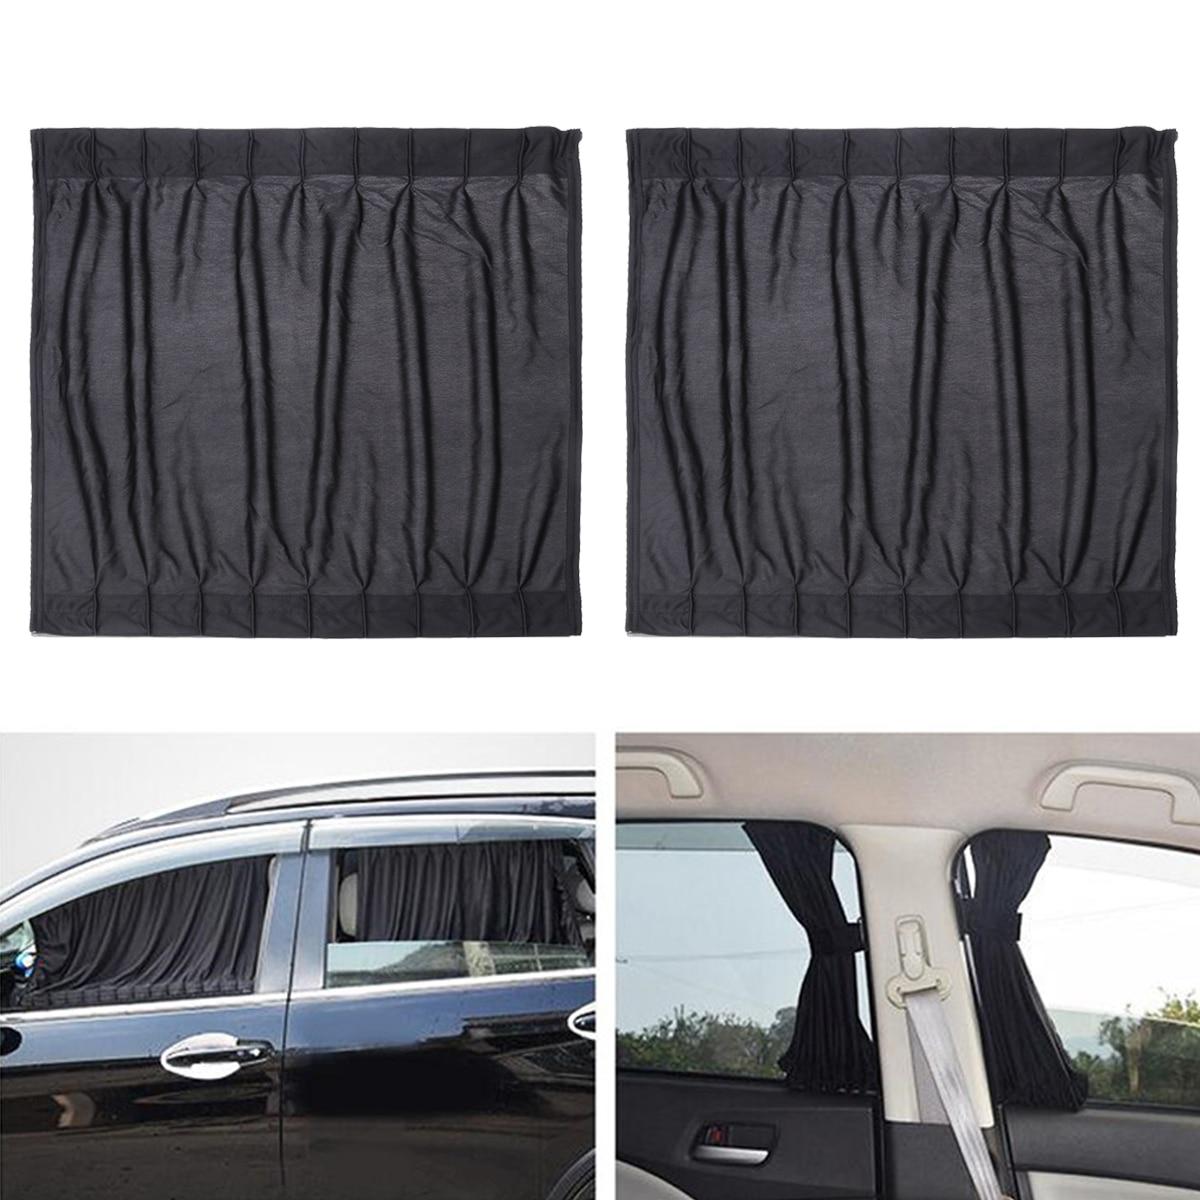 2pcs Car Curtain Side Window Shield Sliding Mesh Car Curtain Anti Heat Sun UV Protector Cover Cortinas Coche Sunshade